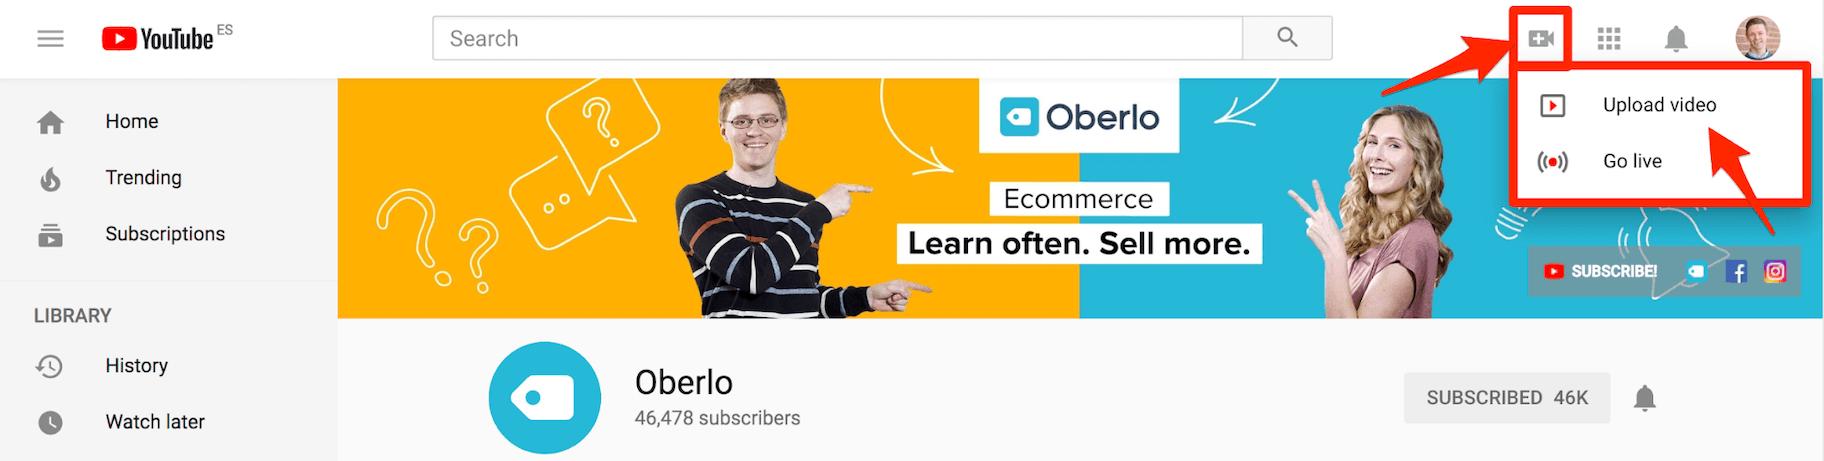 Télécharger vidéo YouTube Ad